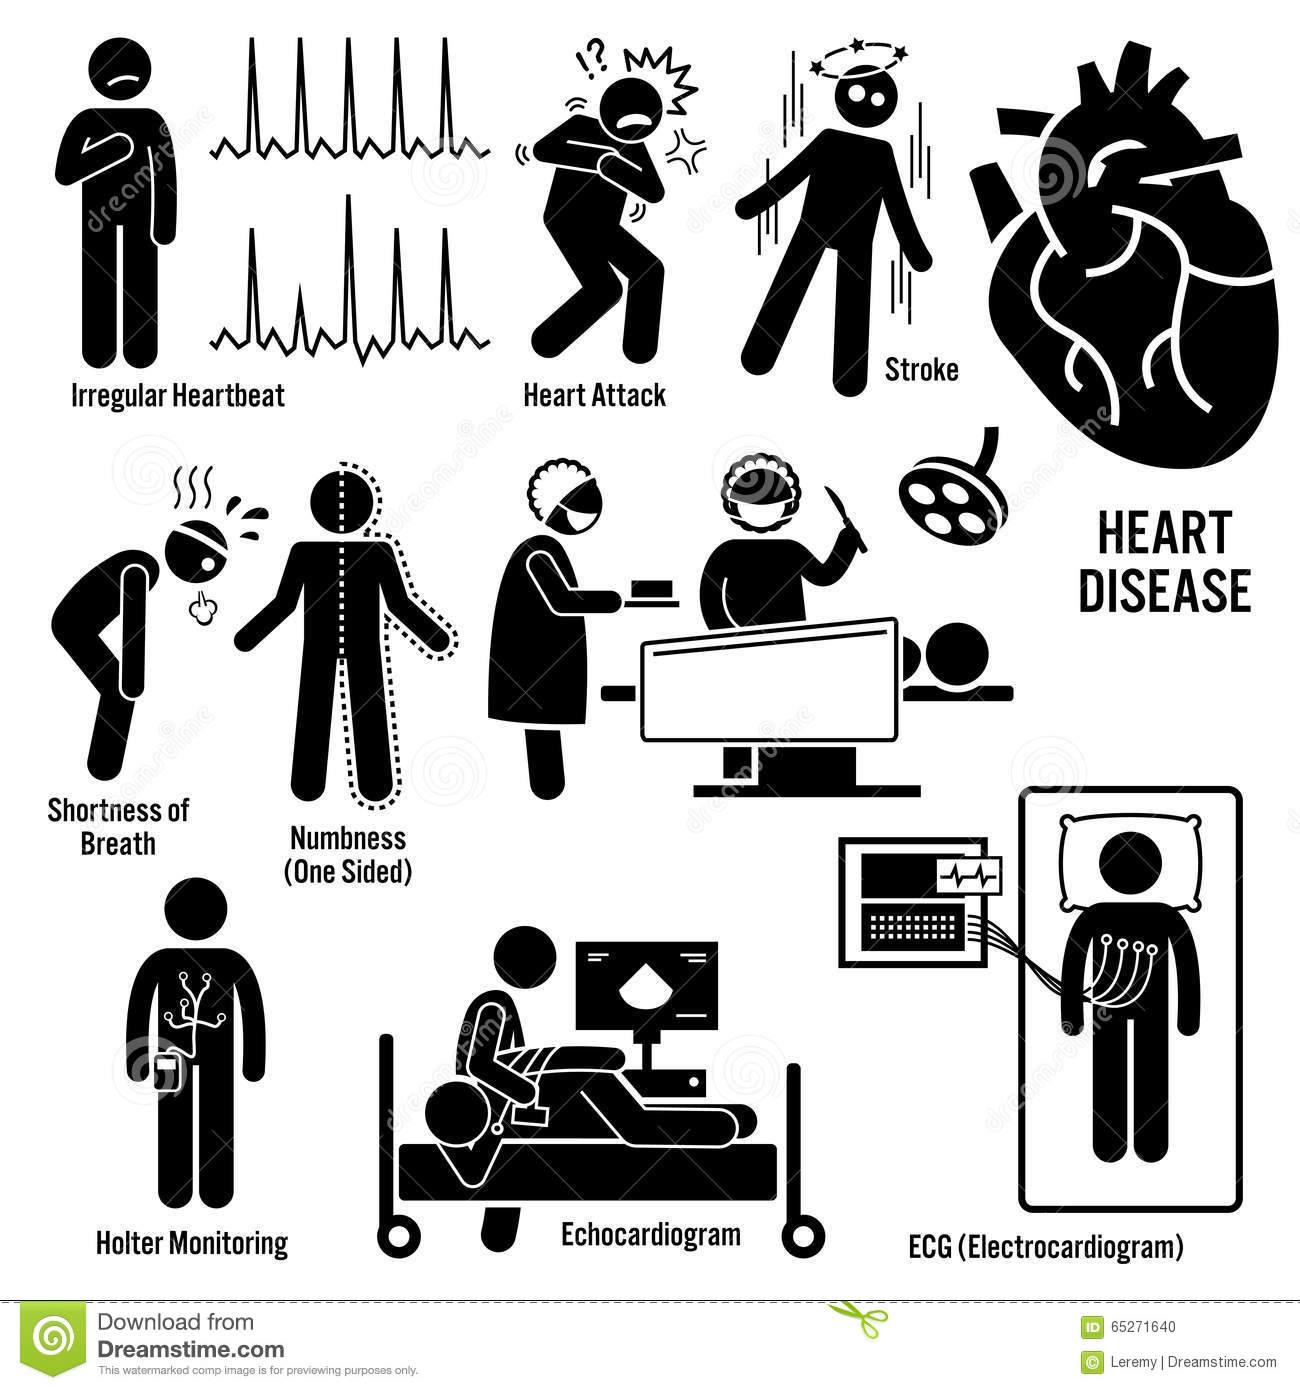 Cardiovascular Disease Heart Attack Coronary Artery Illness.